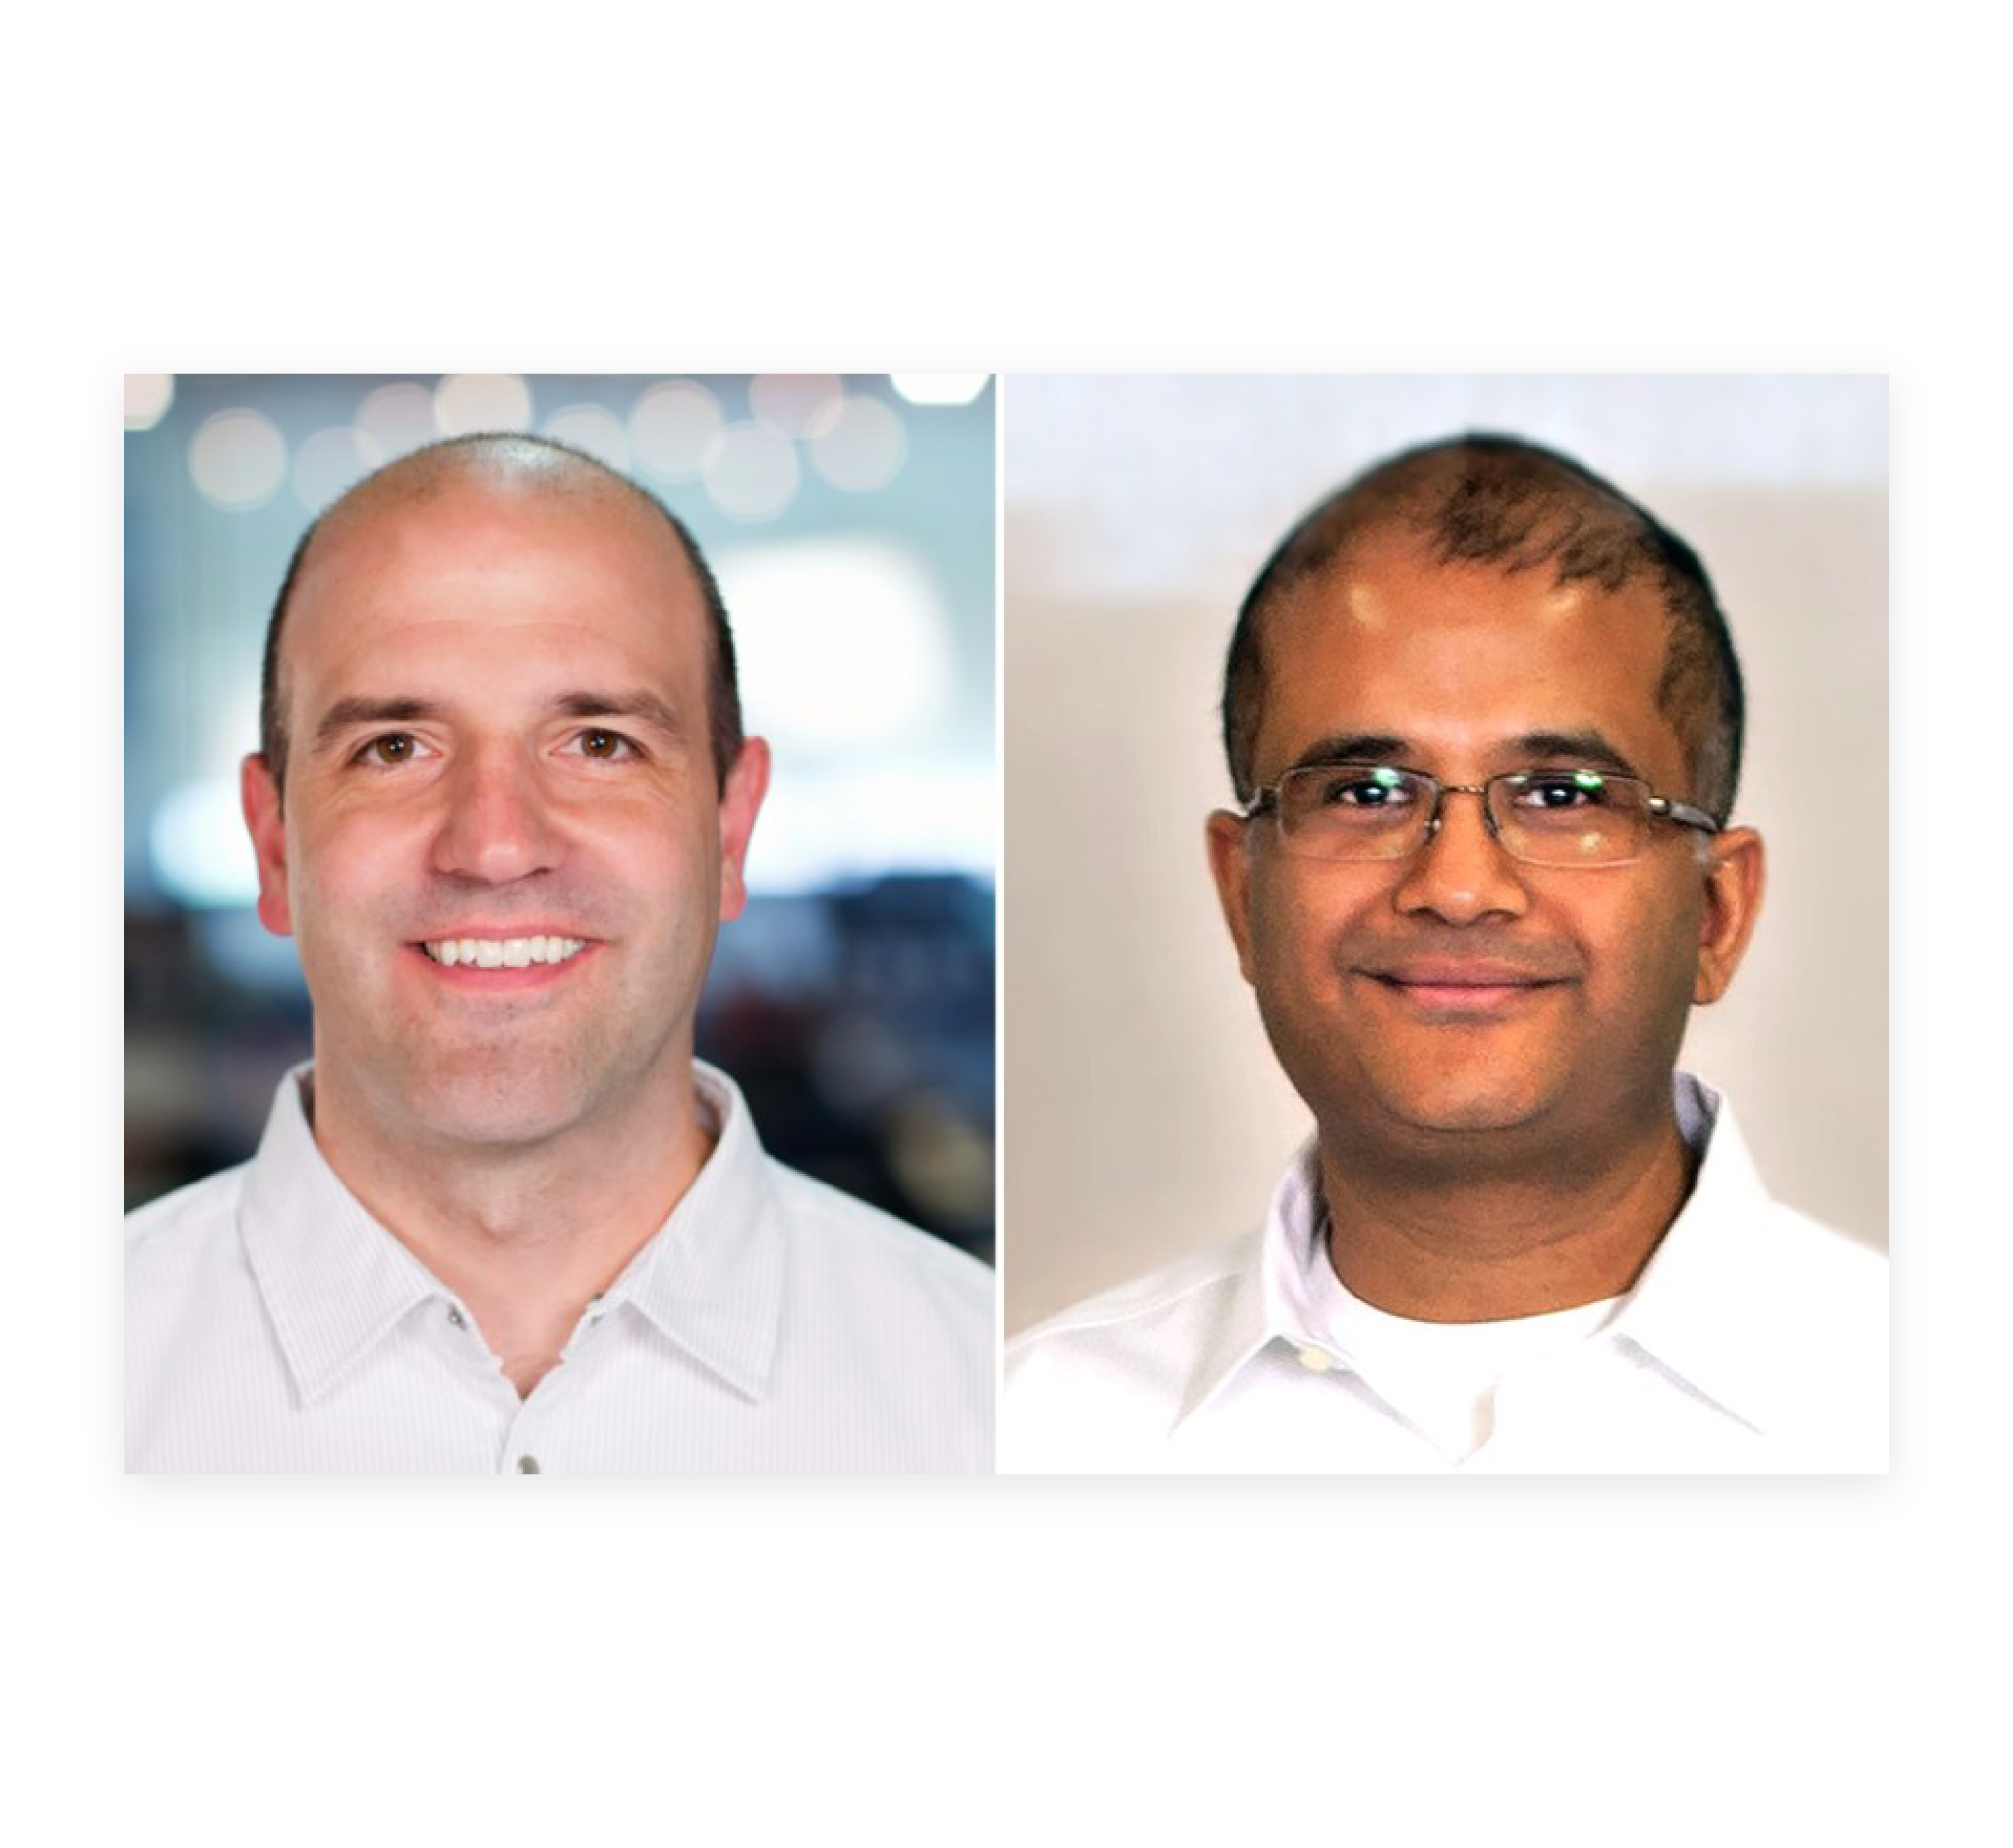 New Breed Board of Directors members Jim O'Neil and Vipul Shah.